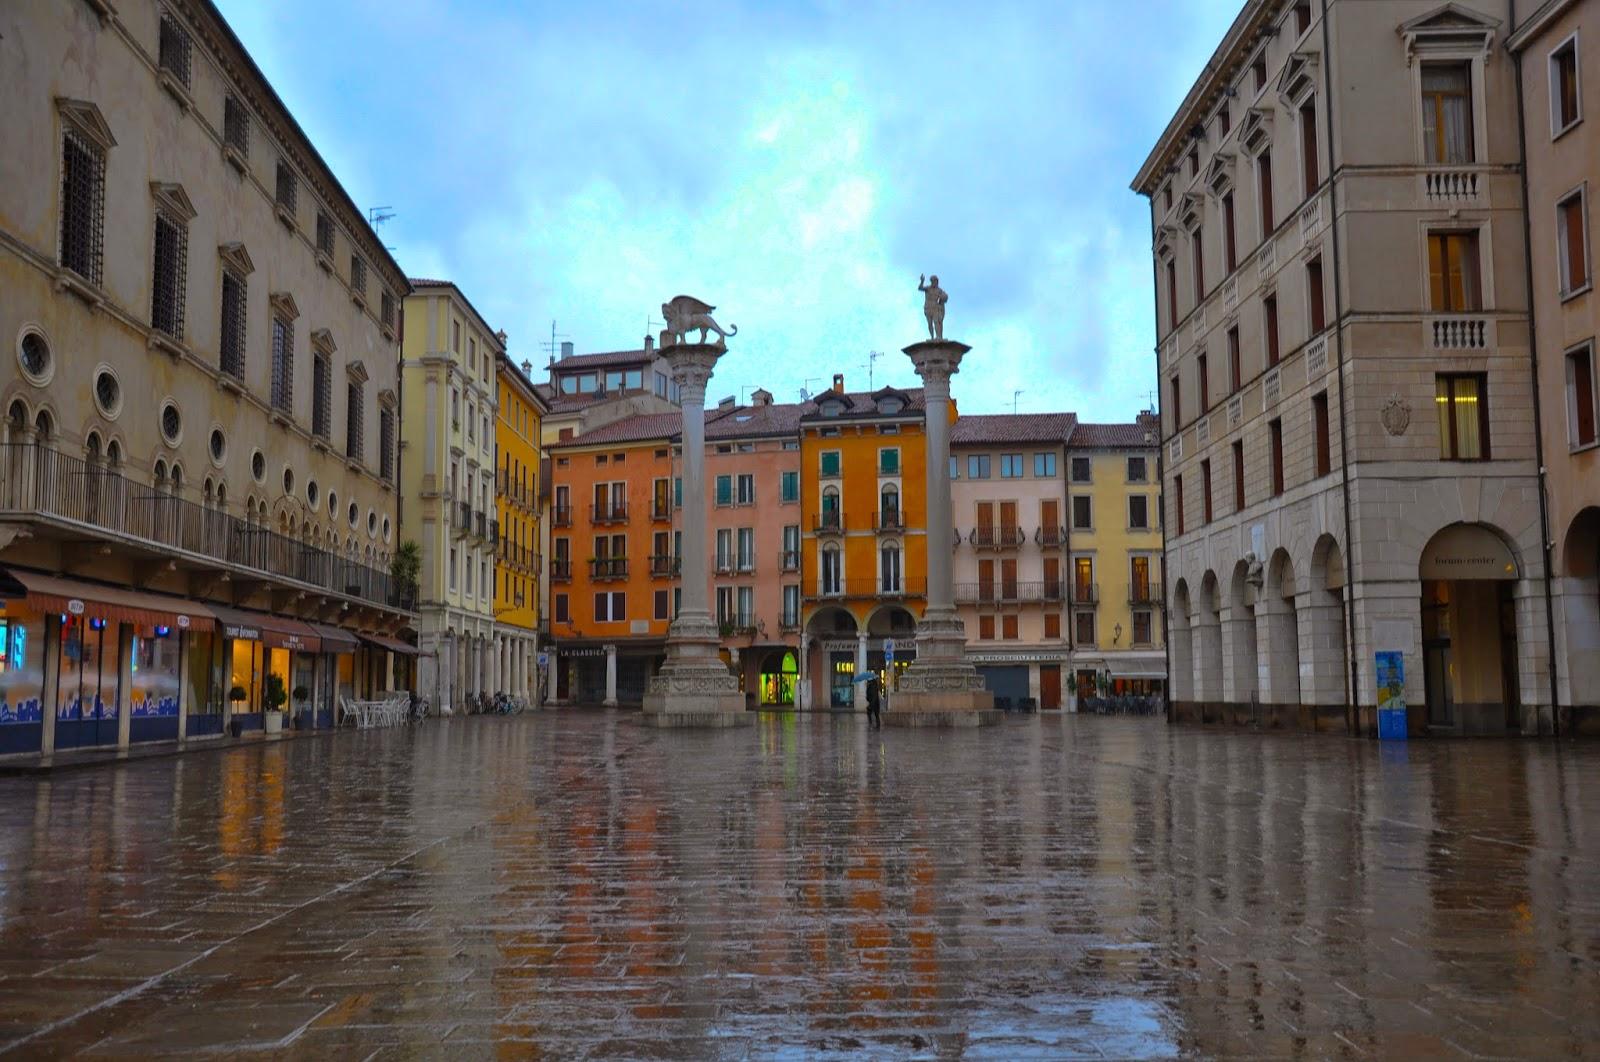 Vicenza Piazza dei Signori drenched torrential rain